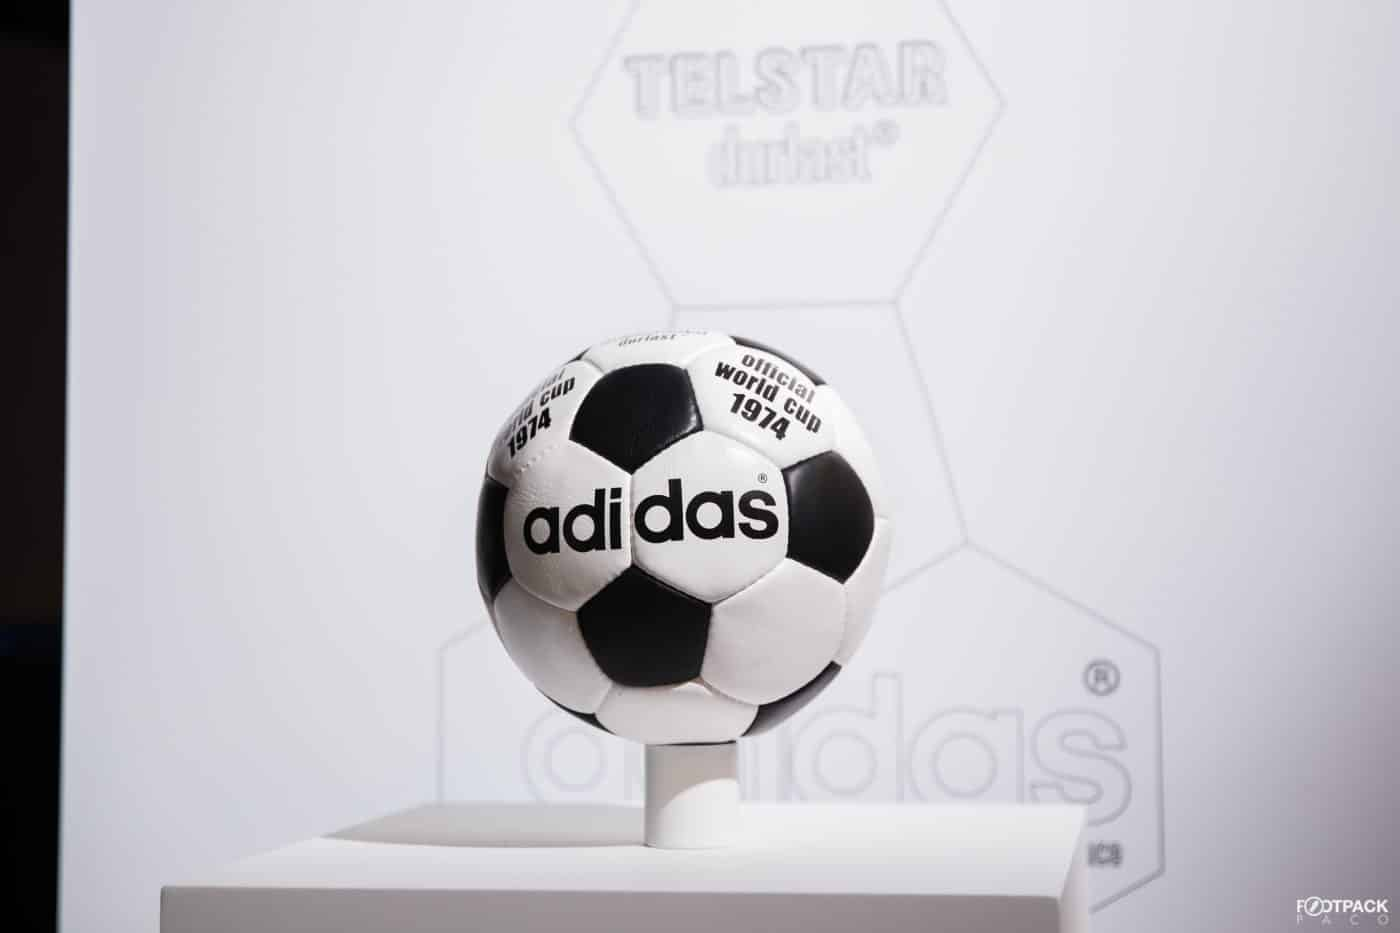 ballon-football-adidas-euro-1976-footpack-2019-2